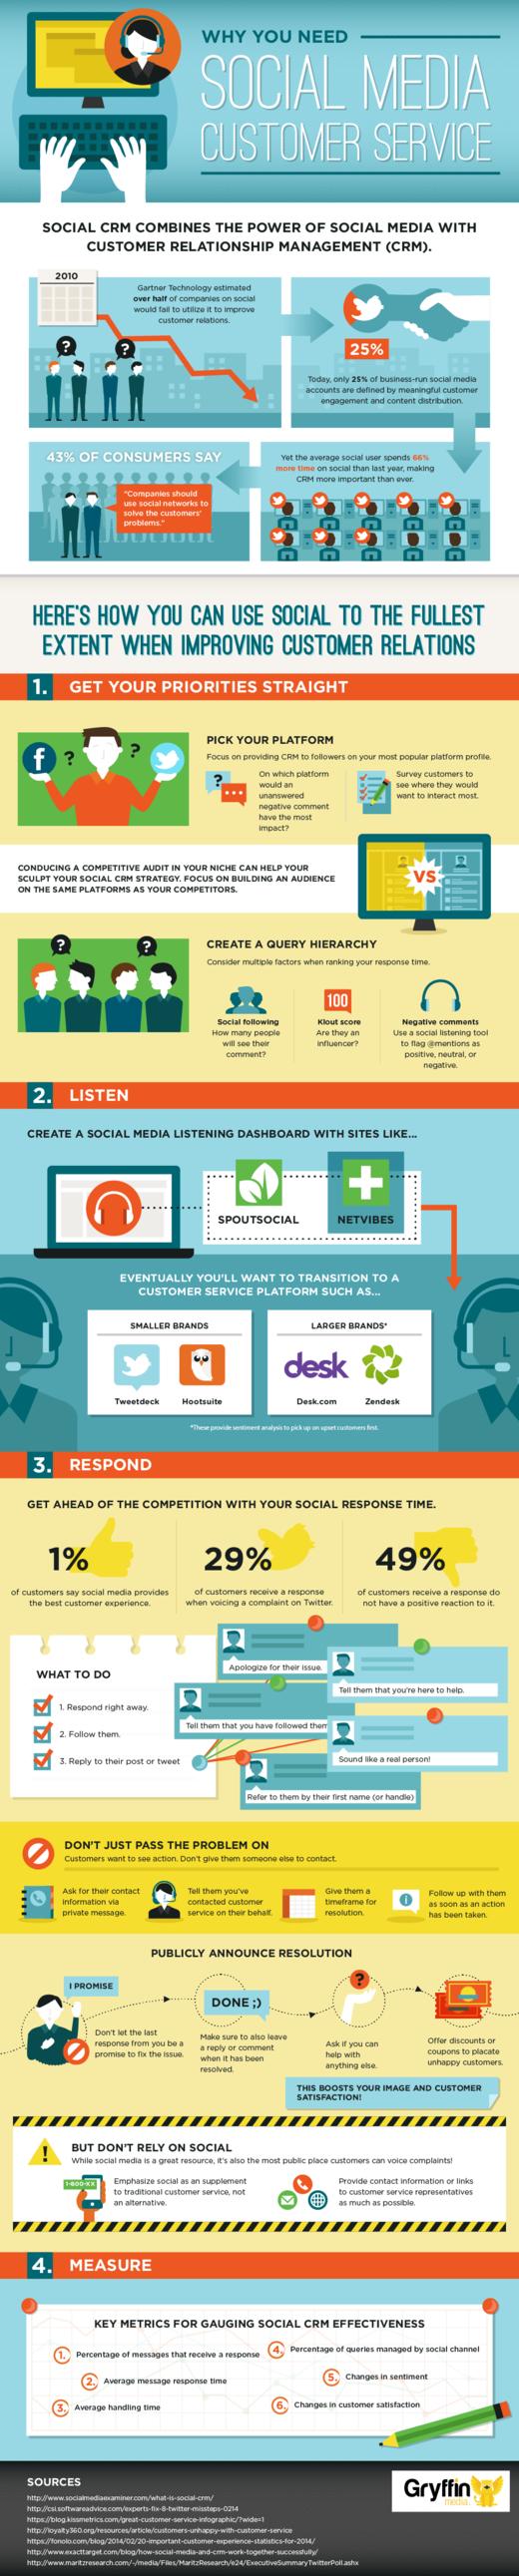 SocialMediaCustomerService (1)